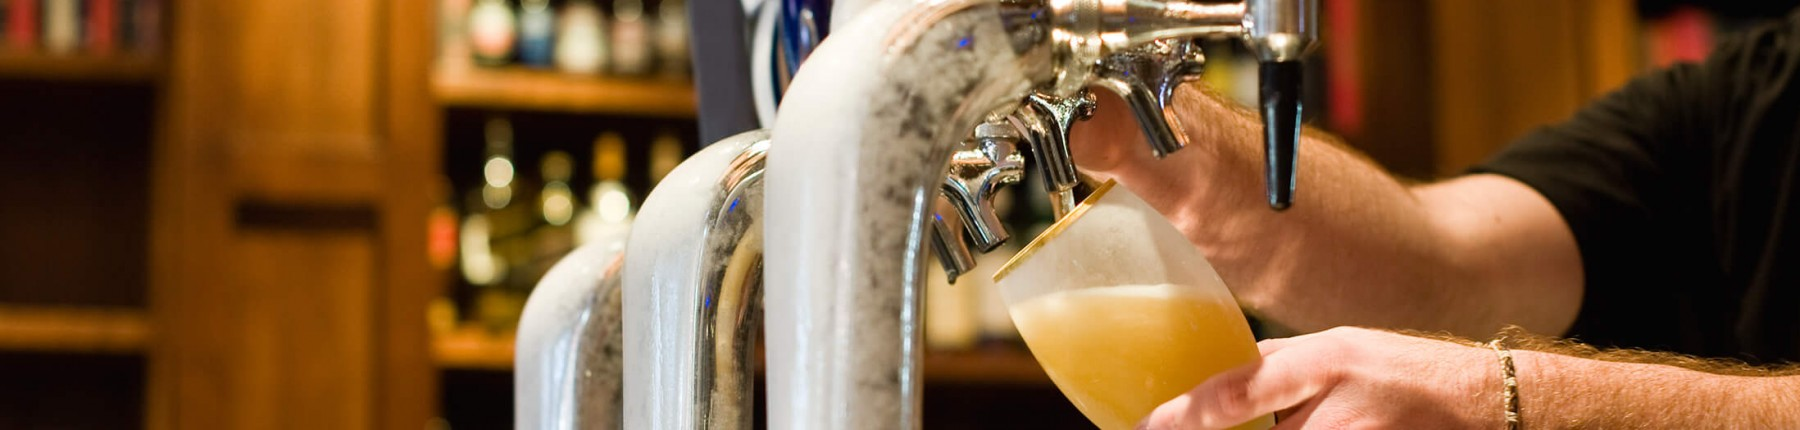 Cold beer at Madden's restaurants in Brainerd MN